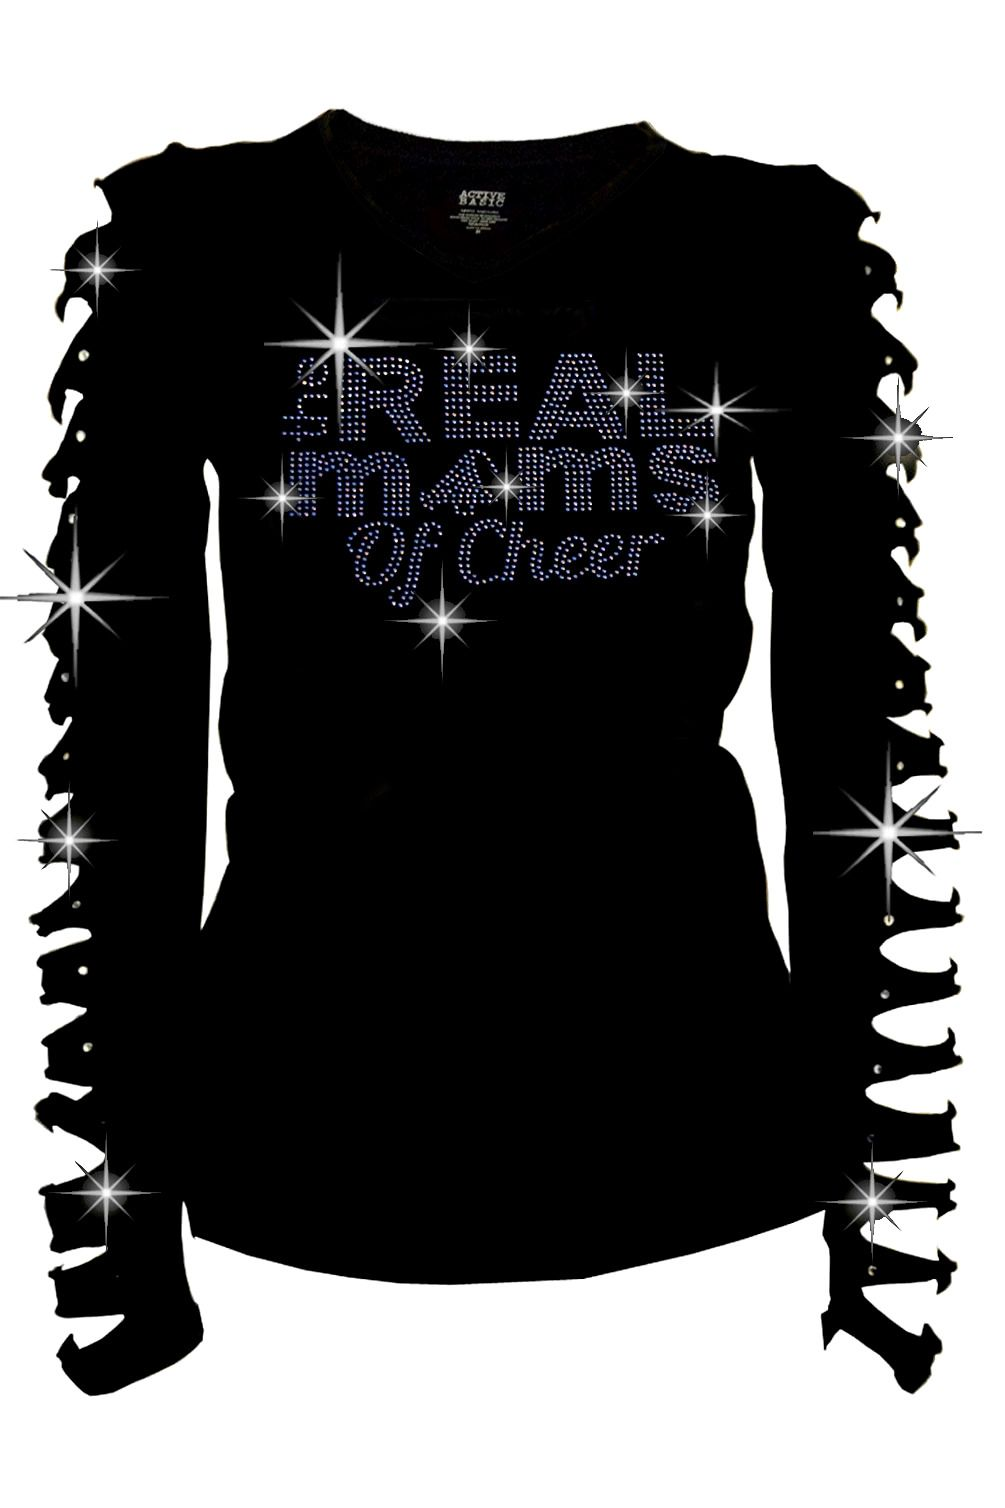 Endeavor flannel shirt  Cheer Mom Shirt The Real Moms of Cheer BLING BLING RhinestoneRipped